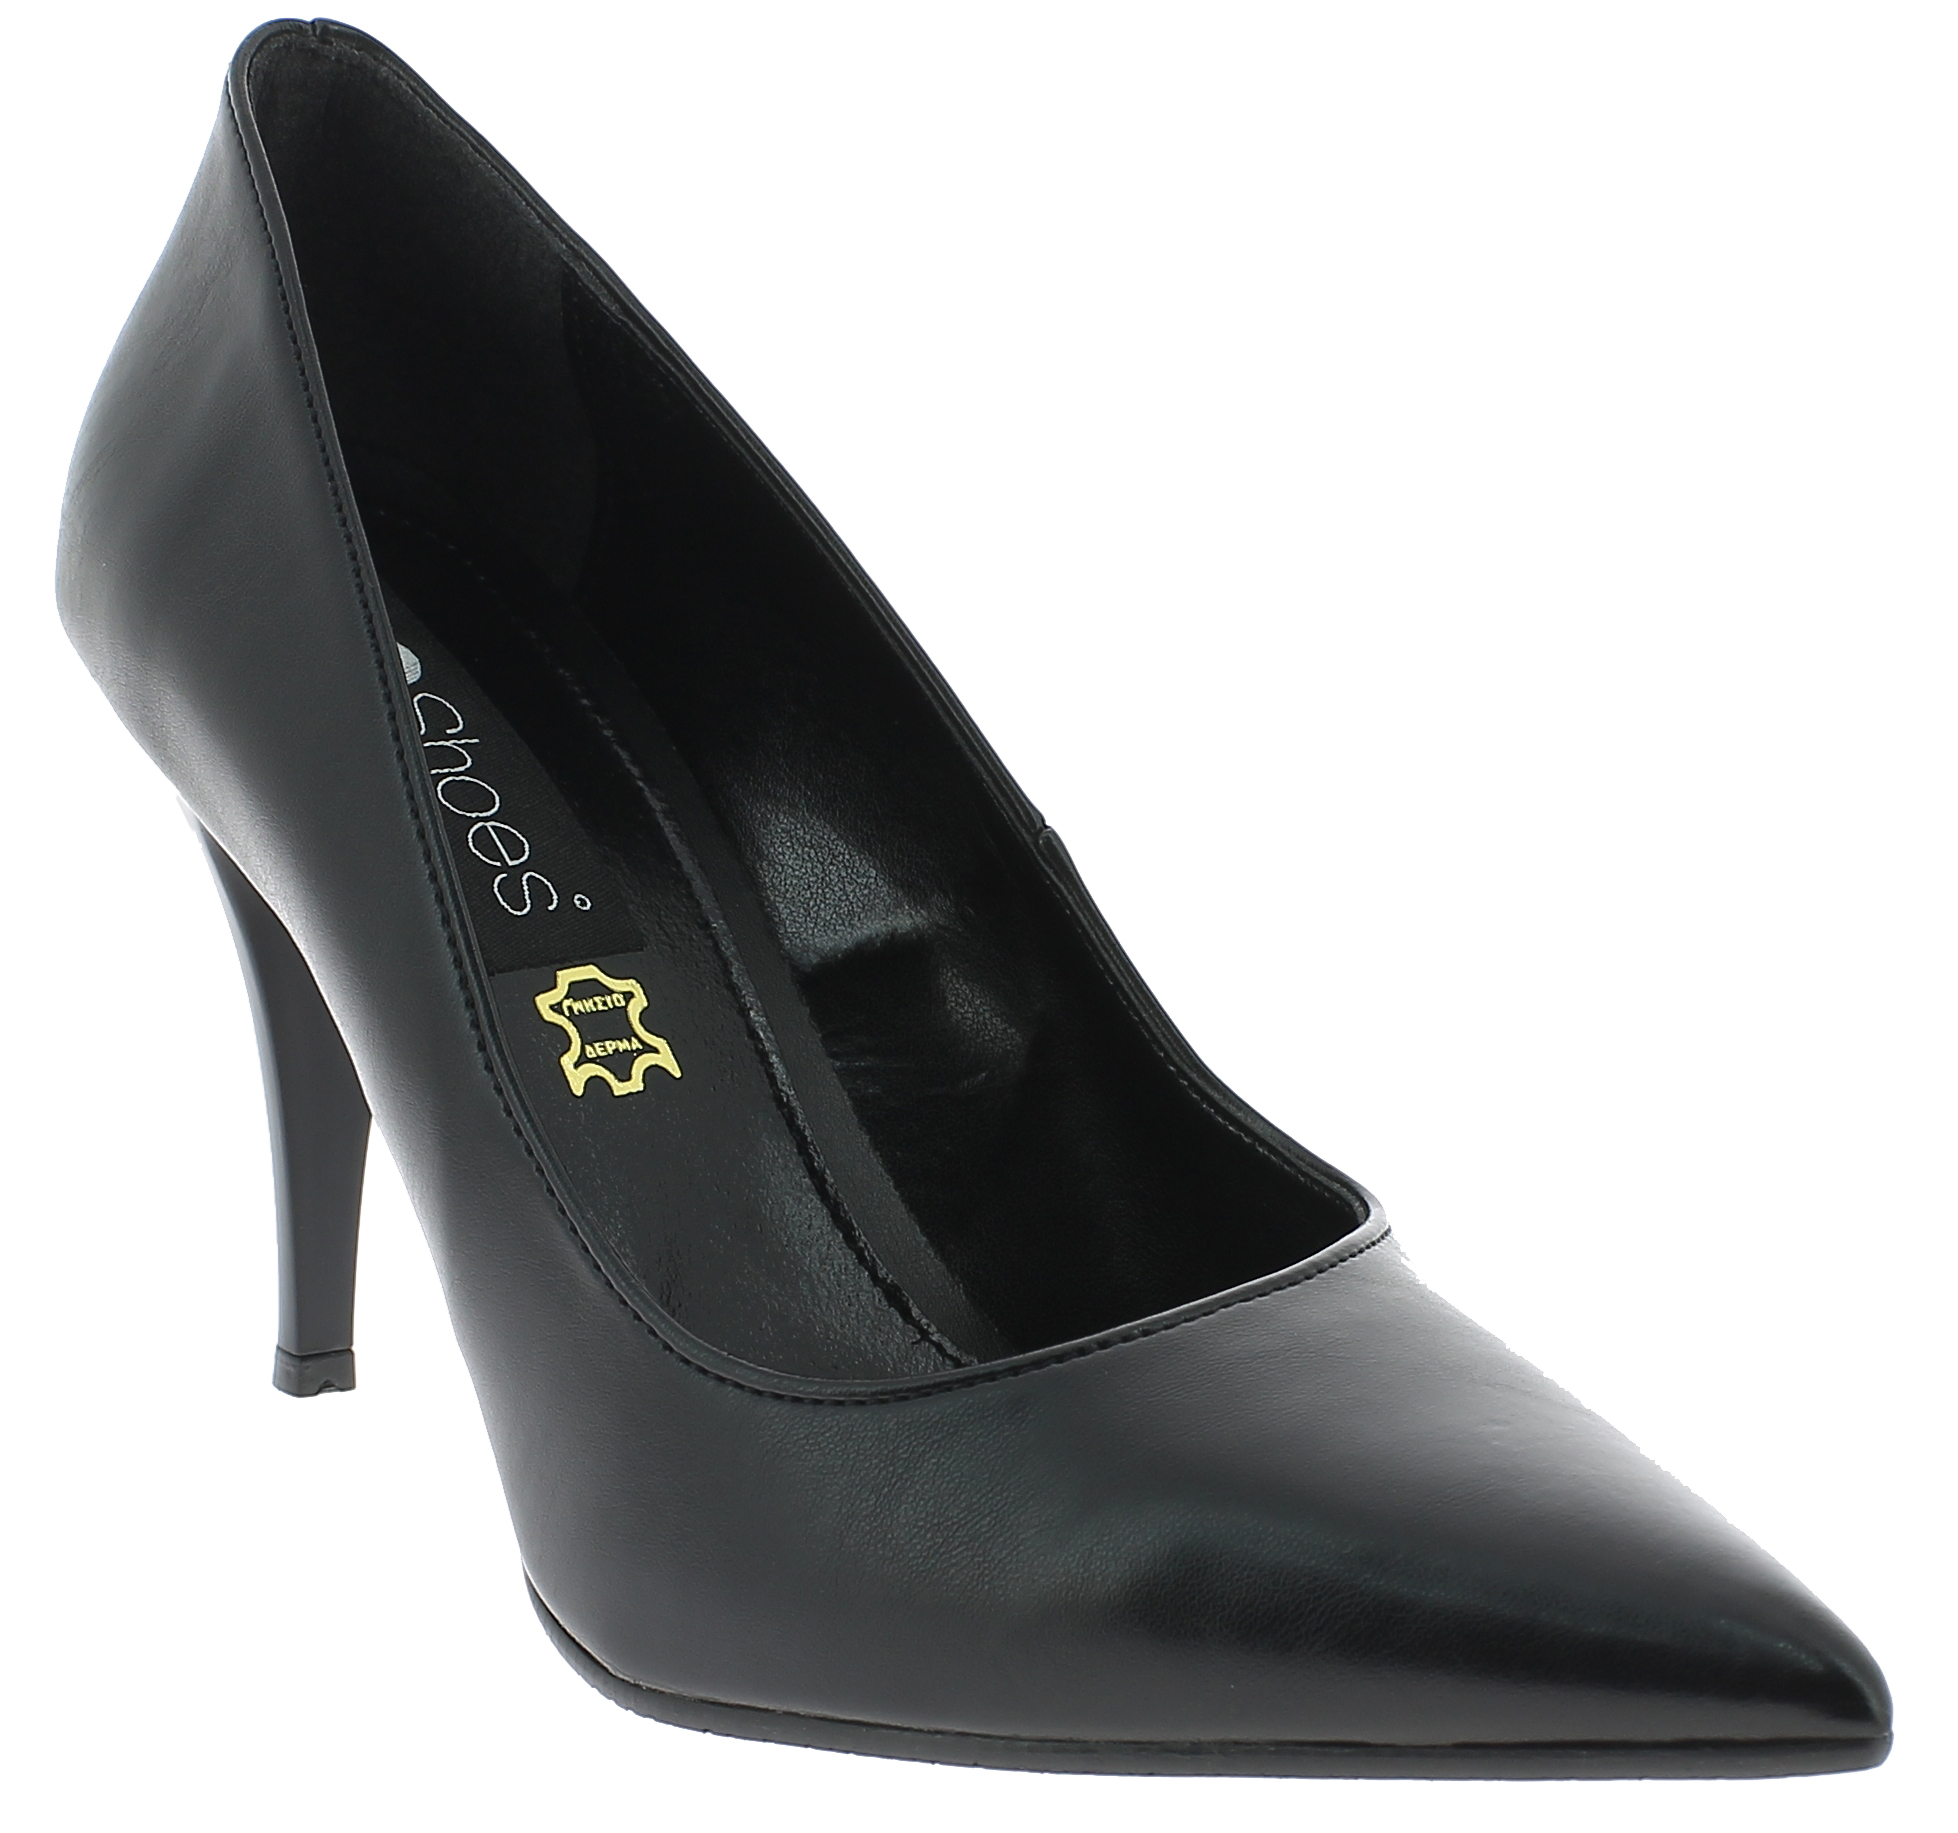 IQSHOES Γυναικεία Γόβα 710 Μαύρο - IqShoes - 41.710 BLACK black 37/1/15/27 παπούτσια  γόβες